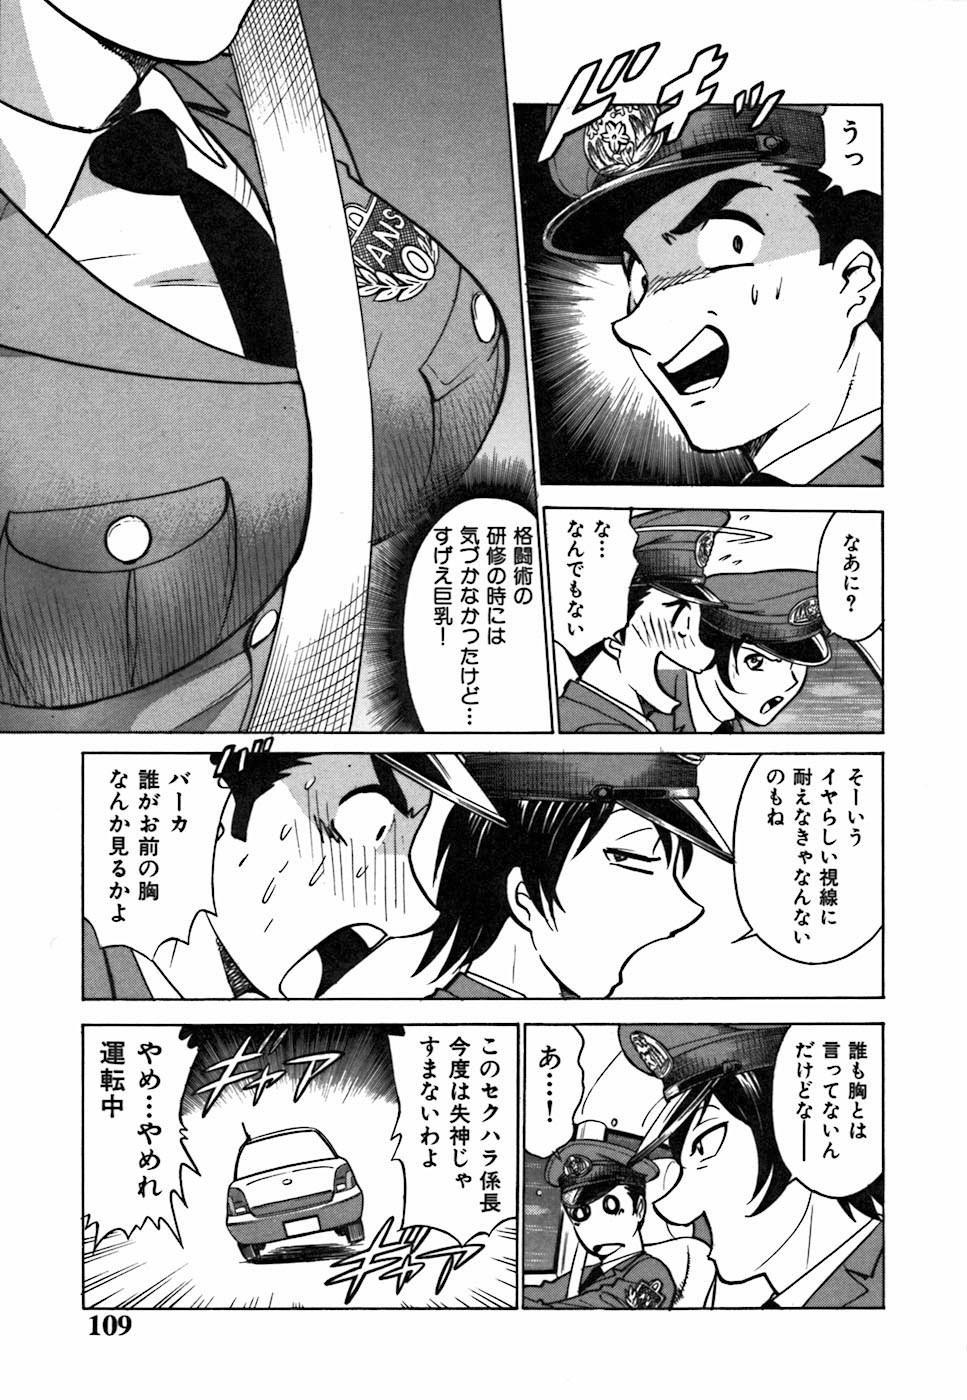 Kimi ga Nozomu Katachi | Appearance for which you hope 108